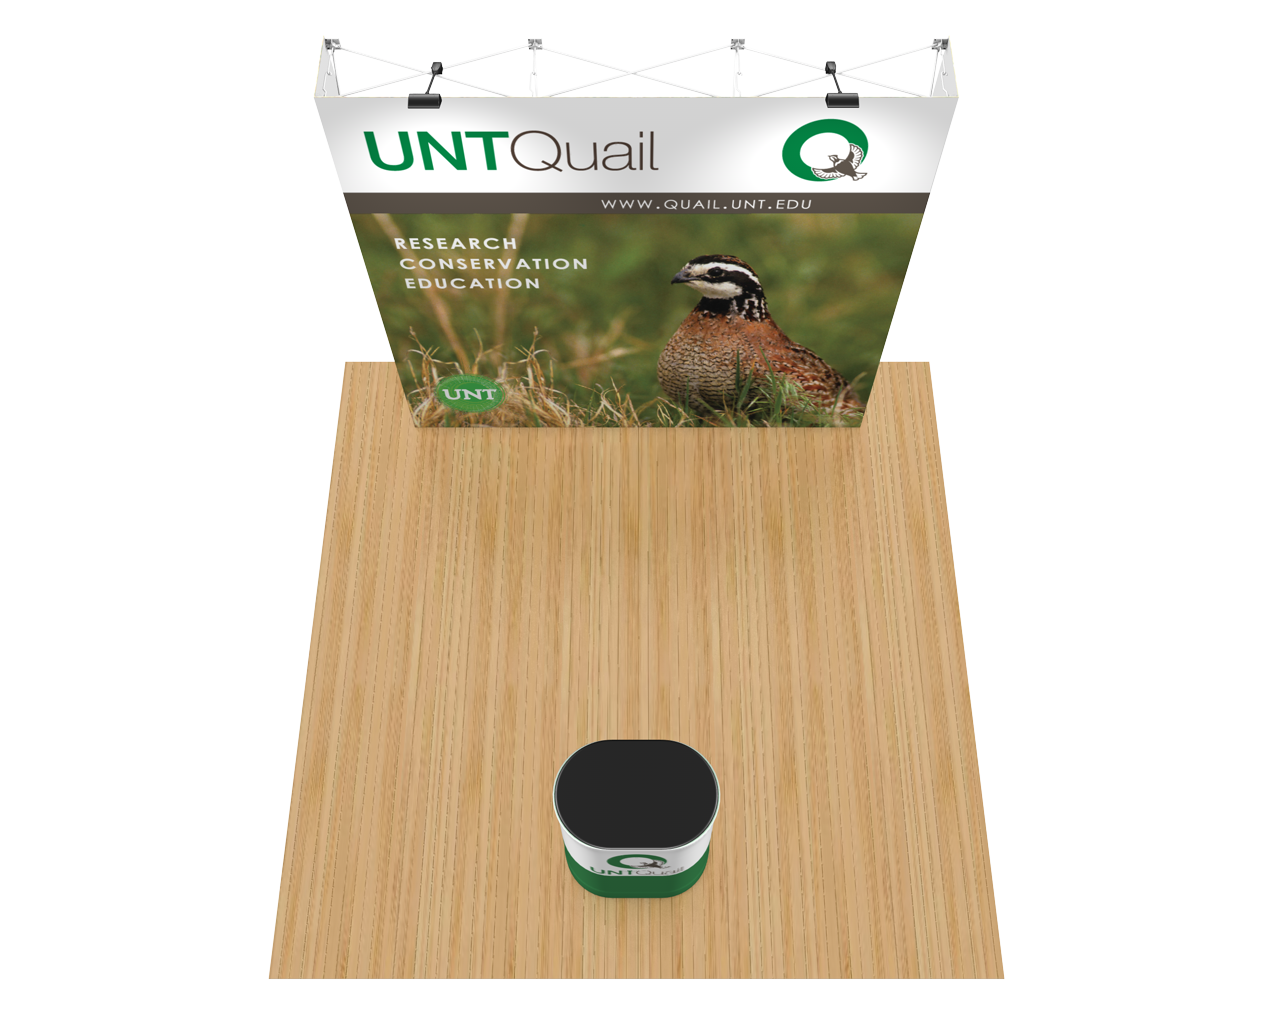 OneFabric Flat 8ft Trade Show Display Kit